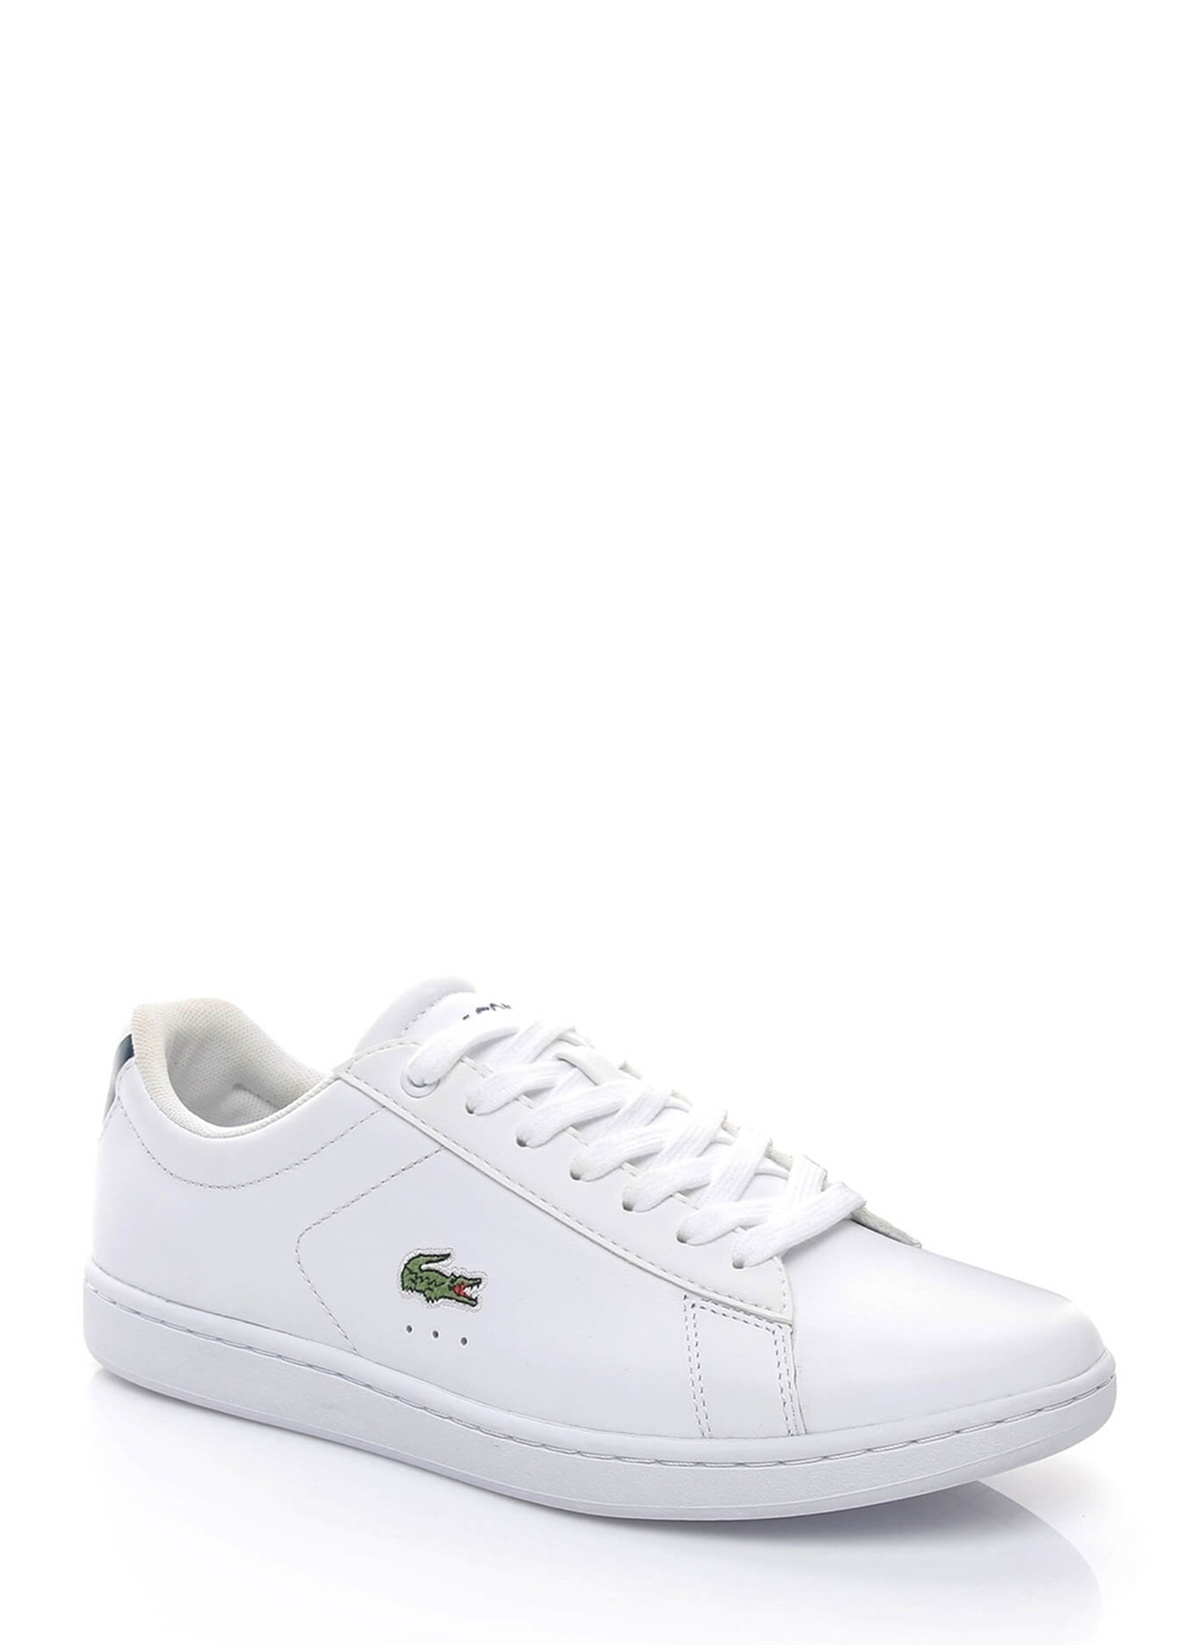 Lacoste Sneakers 732spw0132.001 Lifestyle Ayakkabı – 599.0 TL